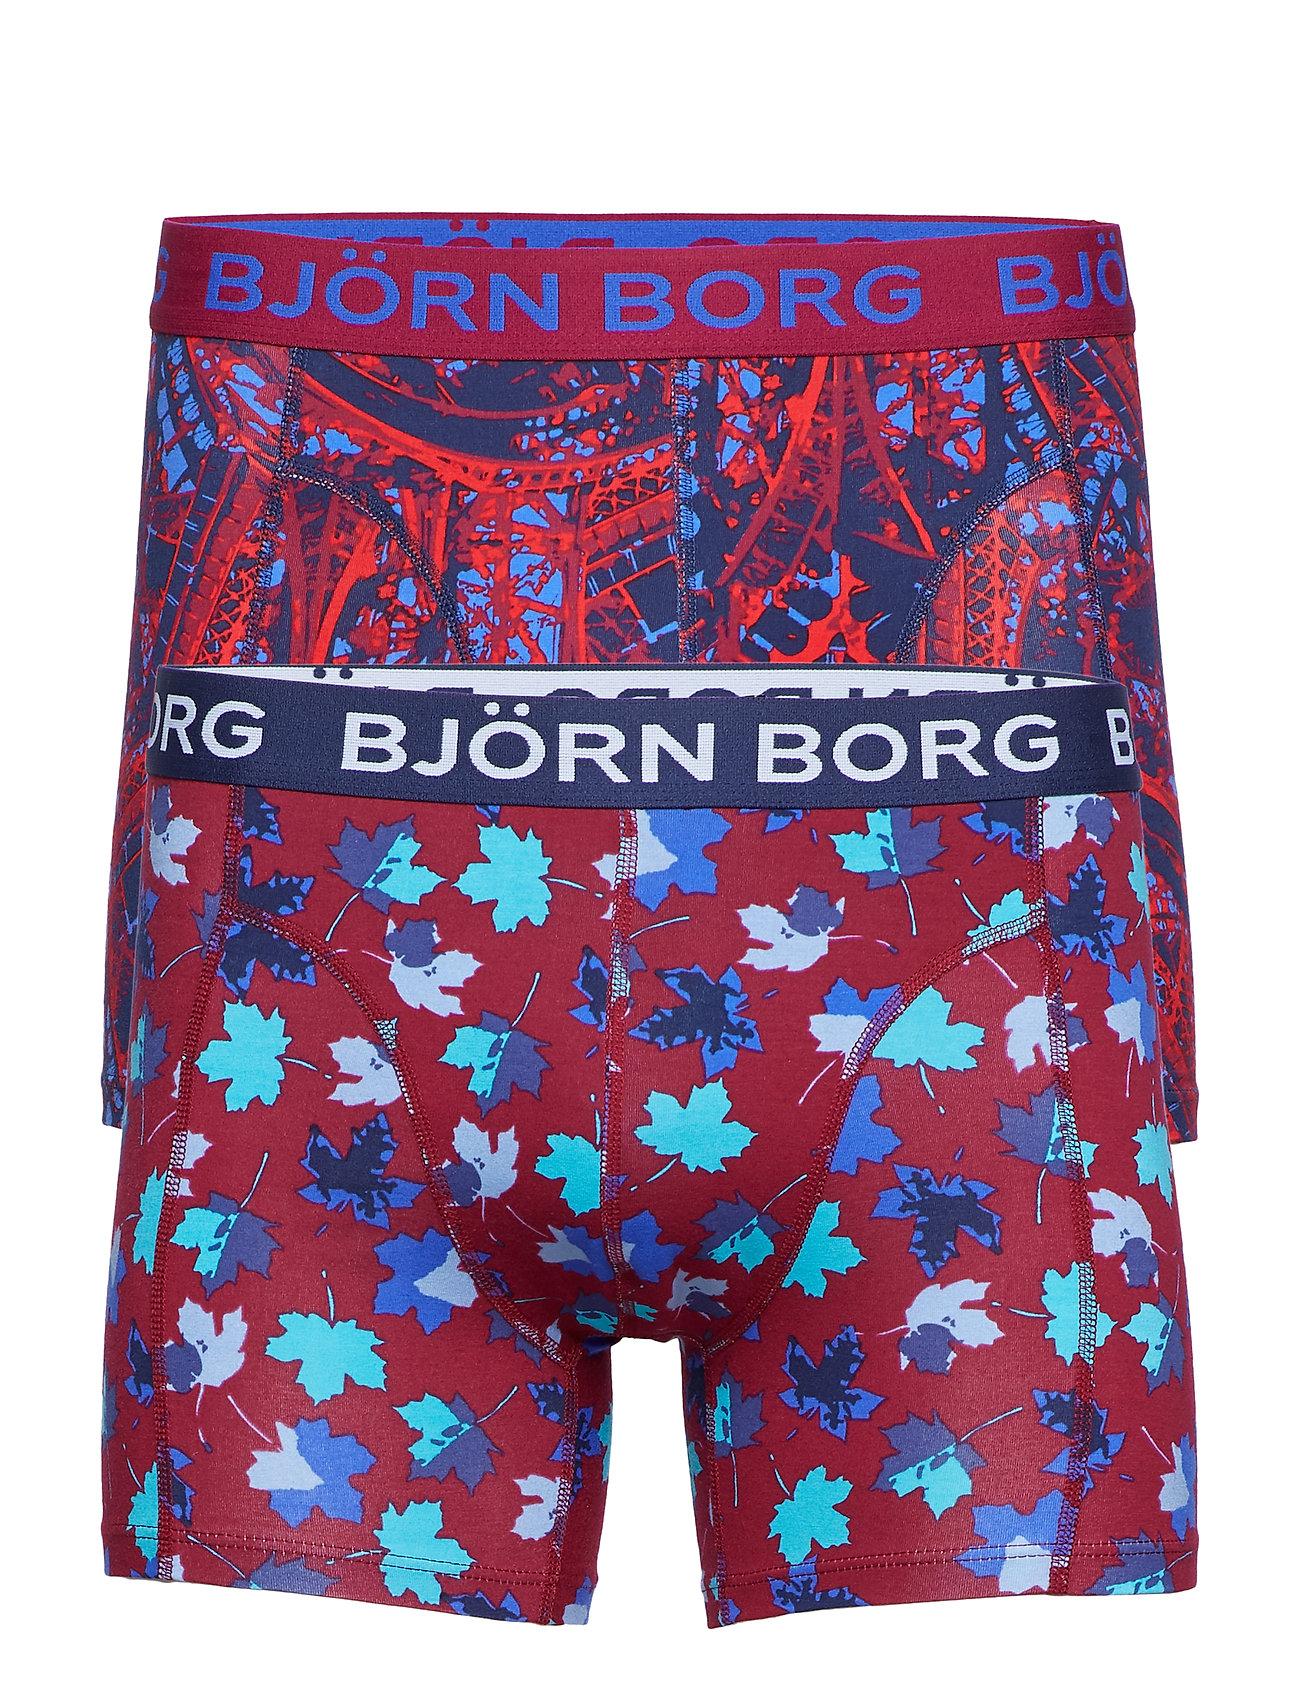 Björn Borg SHORTS BB EIFFEL & BB LEAFS 2p - PEACOAT